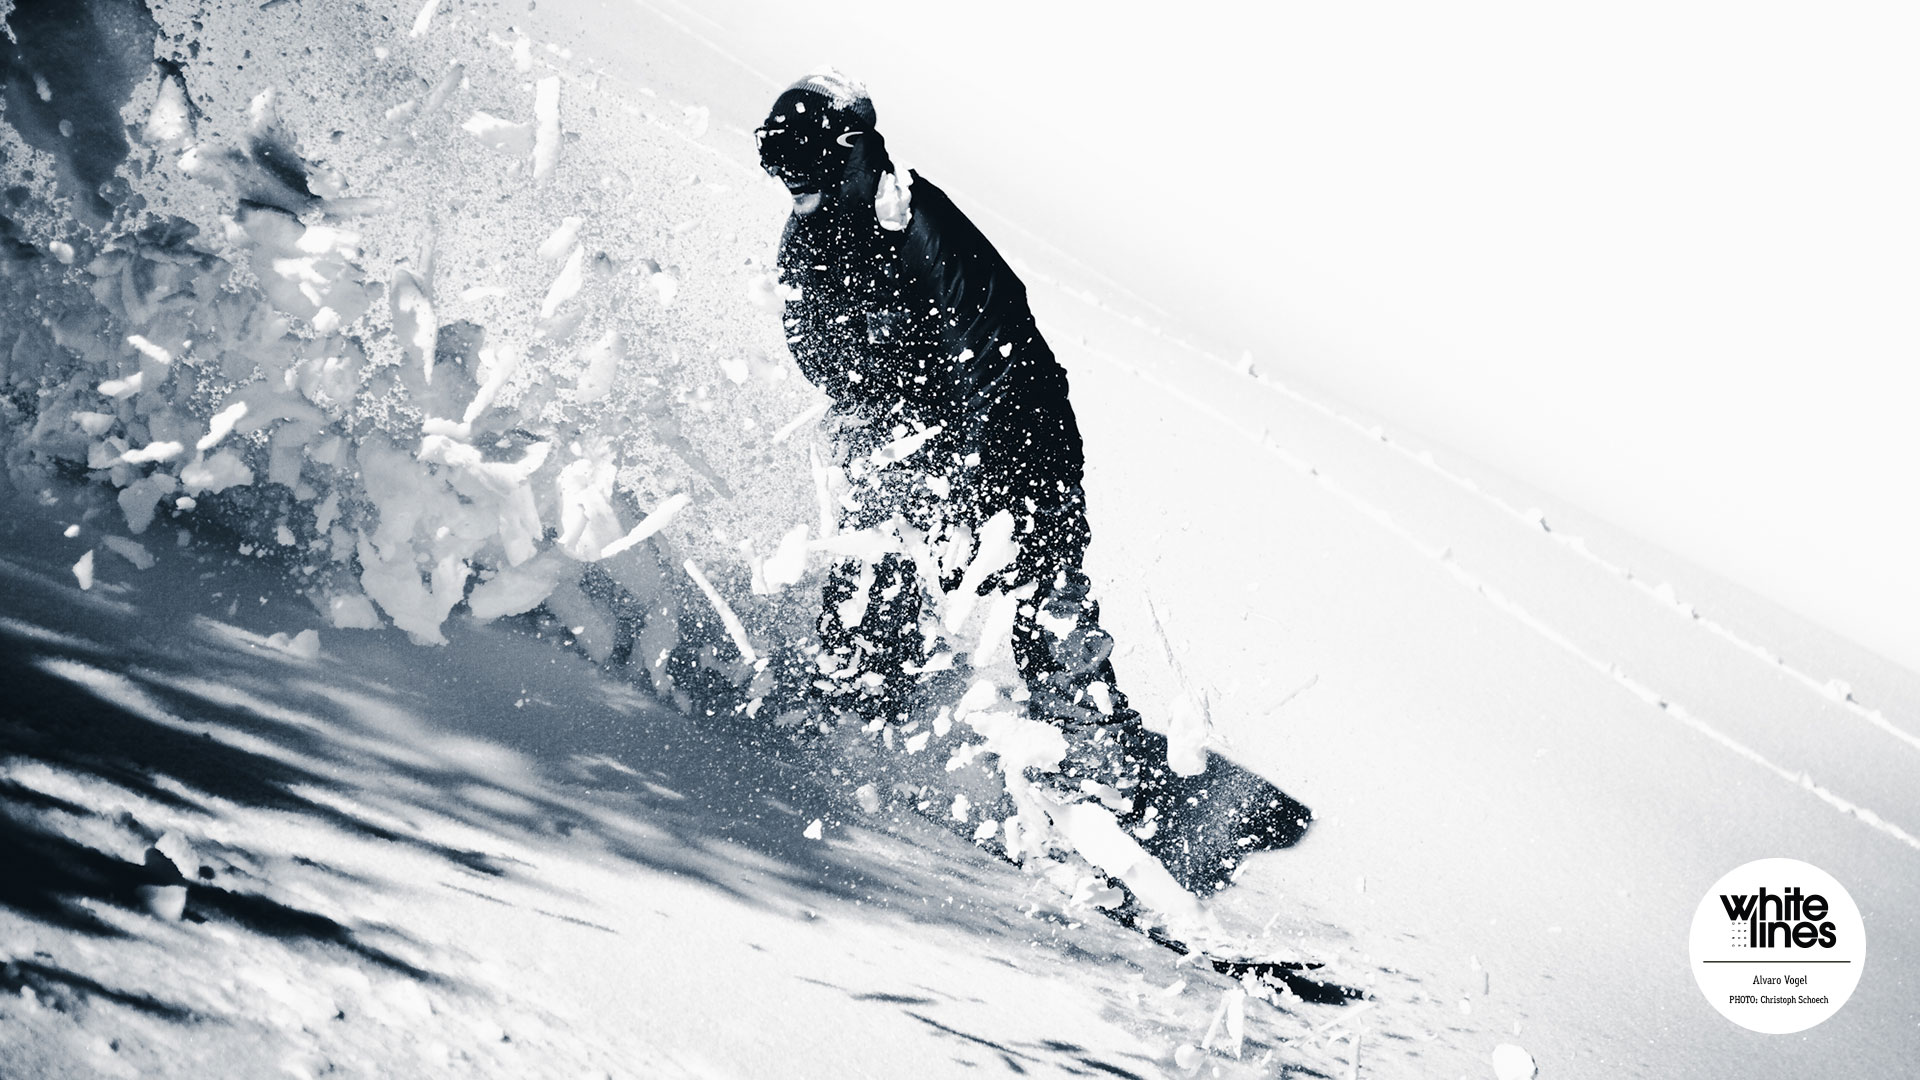 Snowboarding Wallpaper